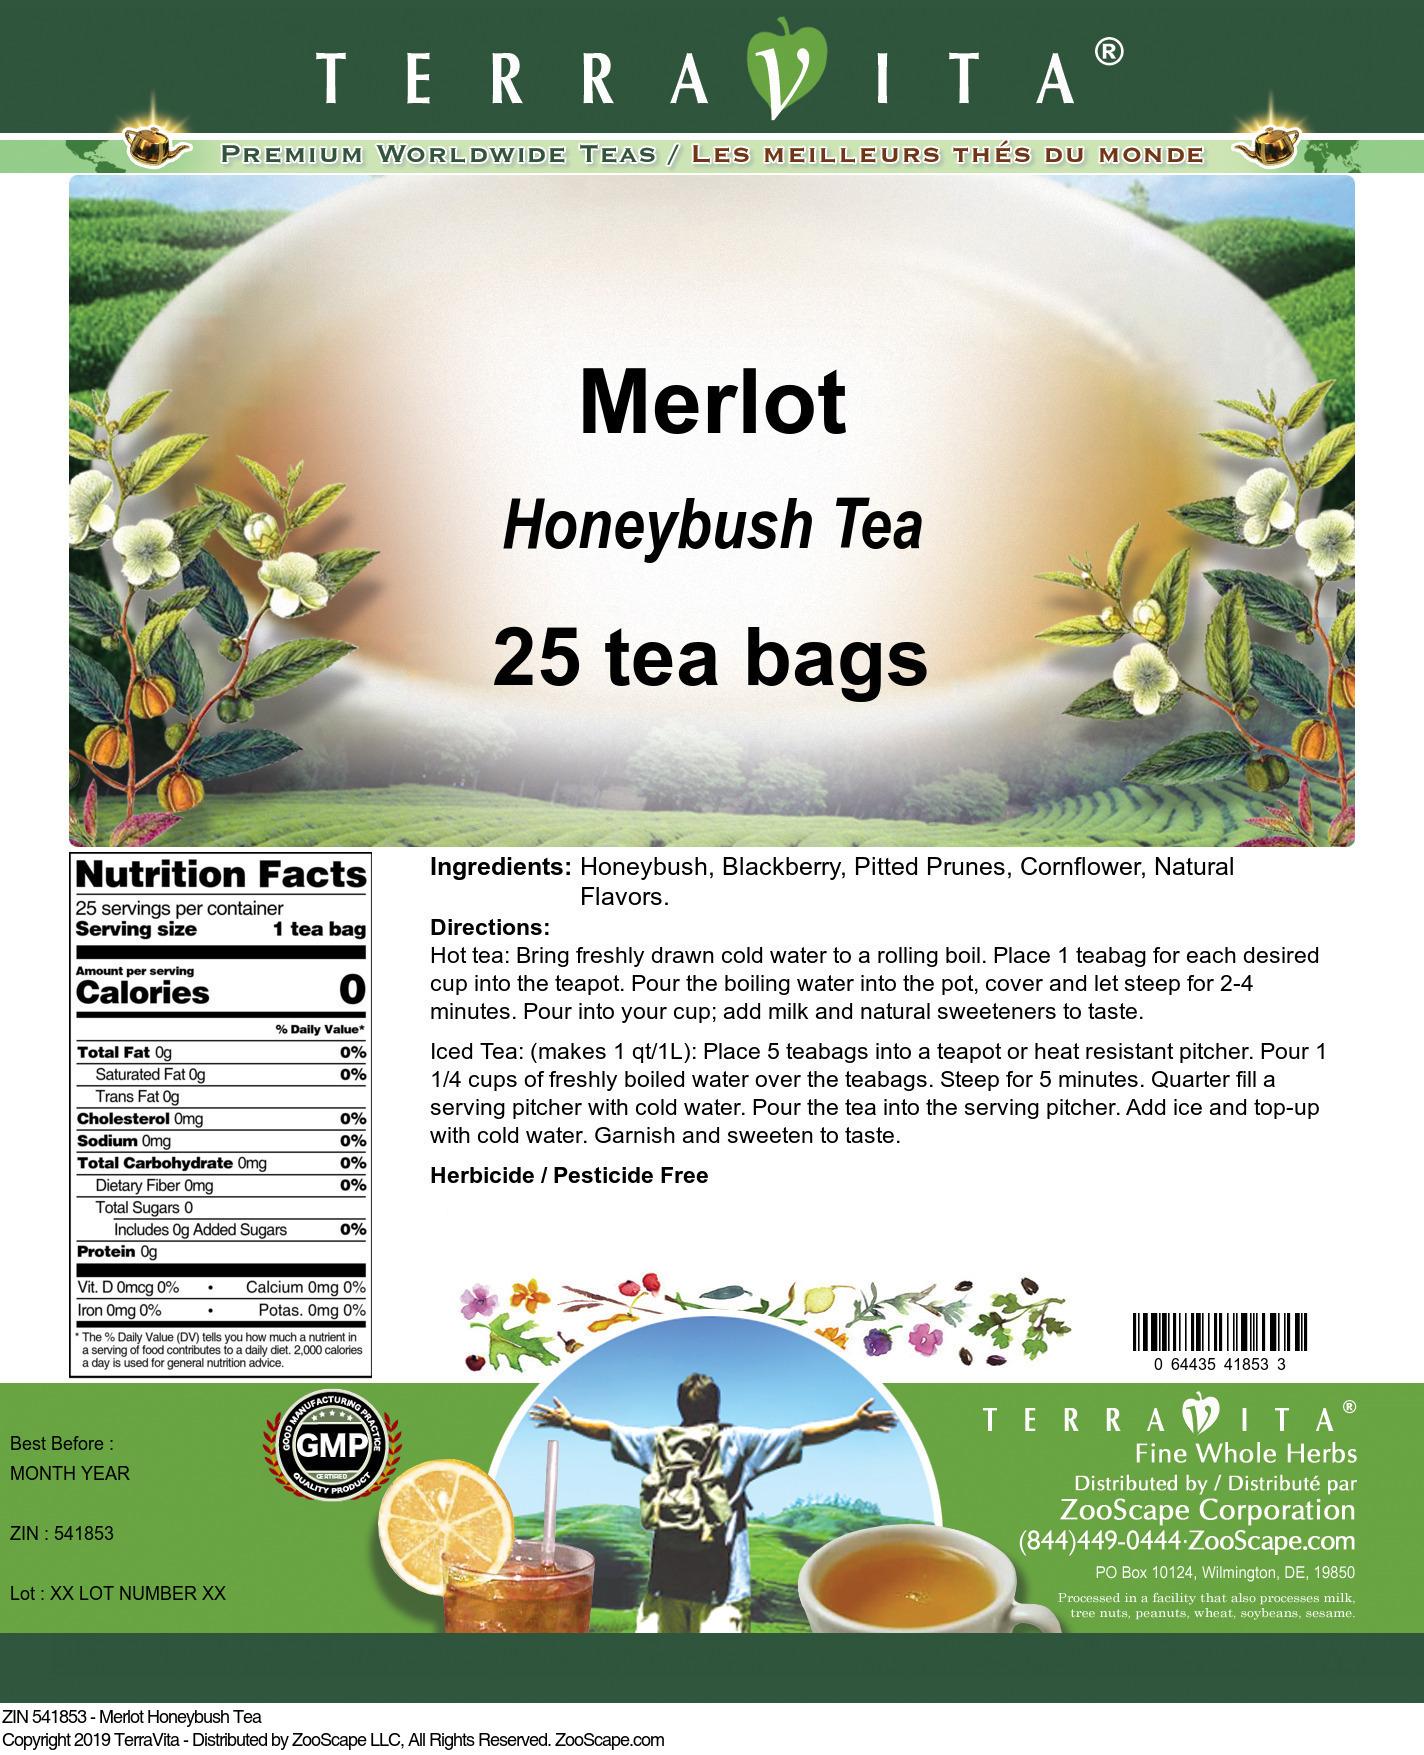 Merlot Honeybush Tea